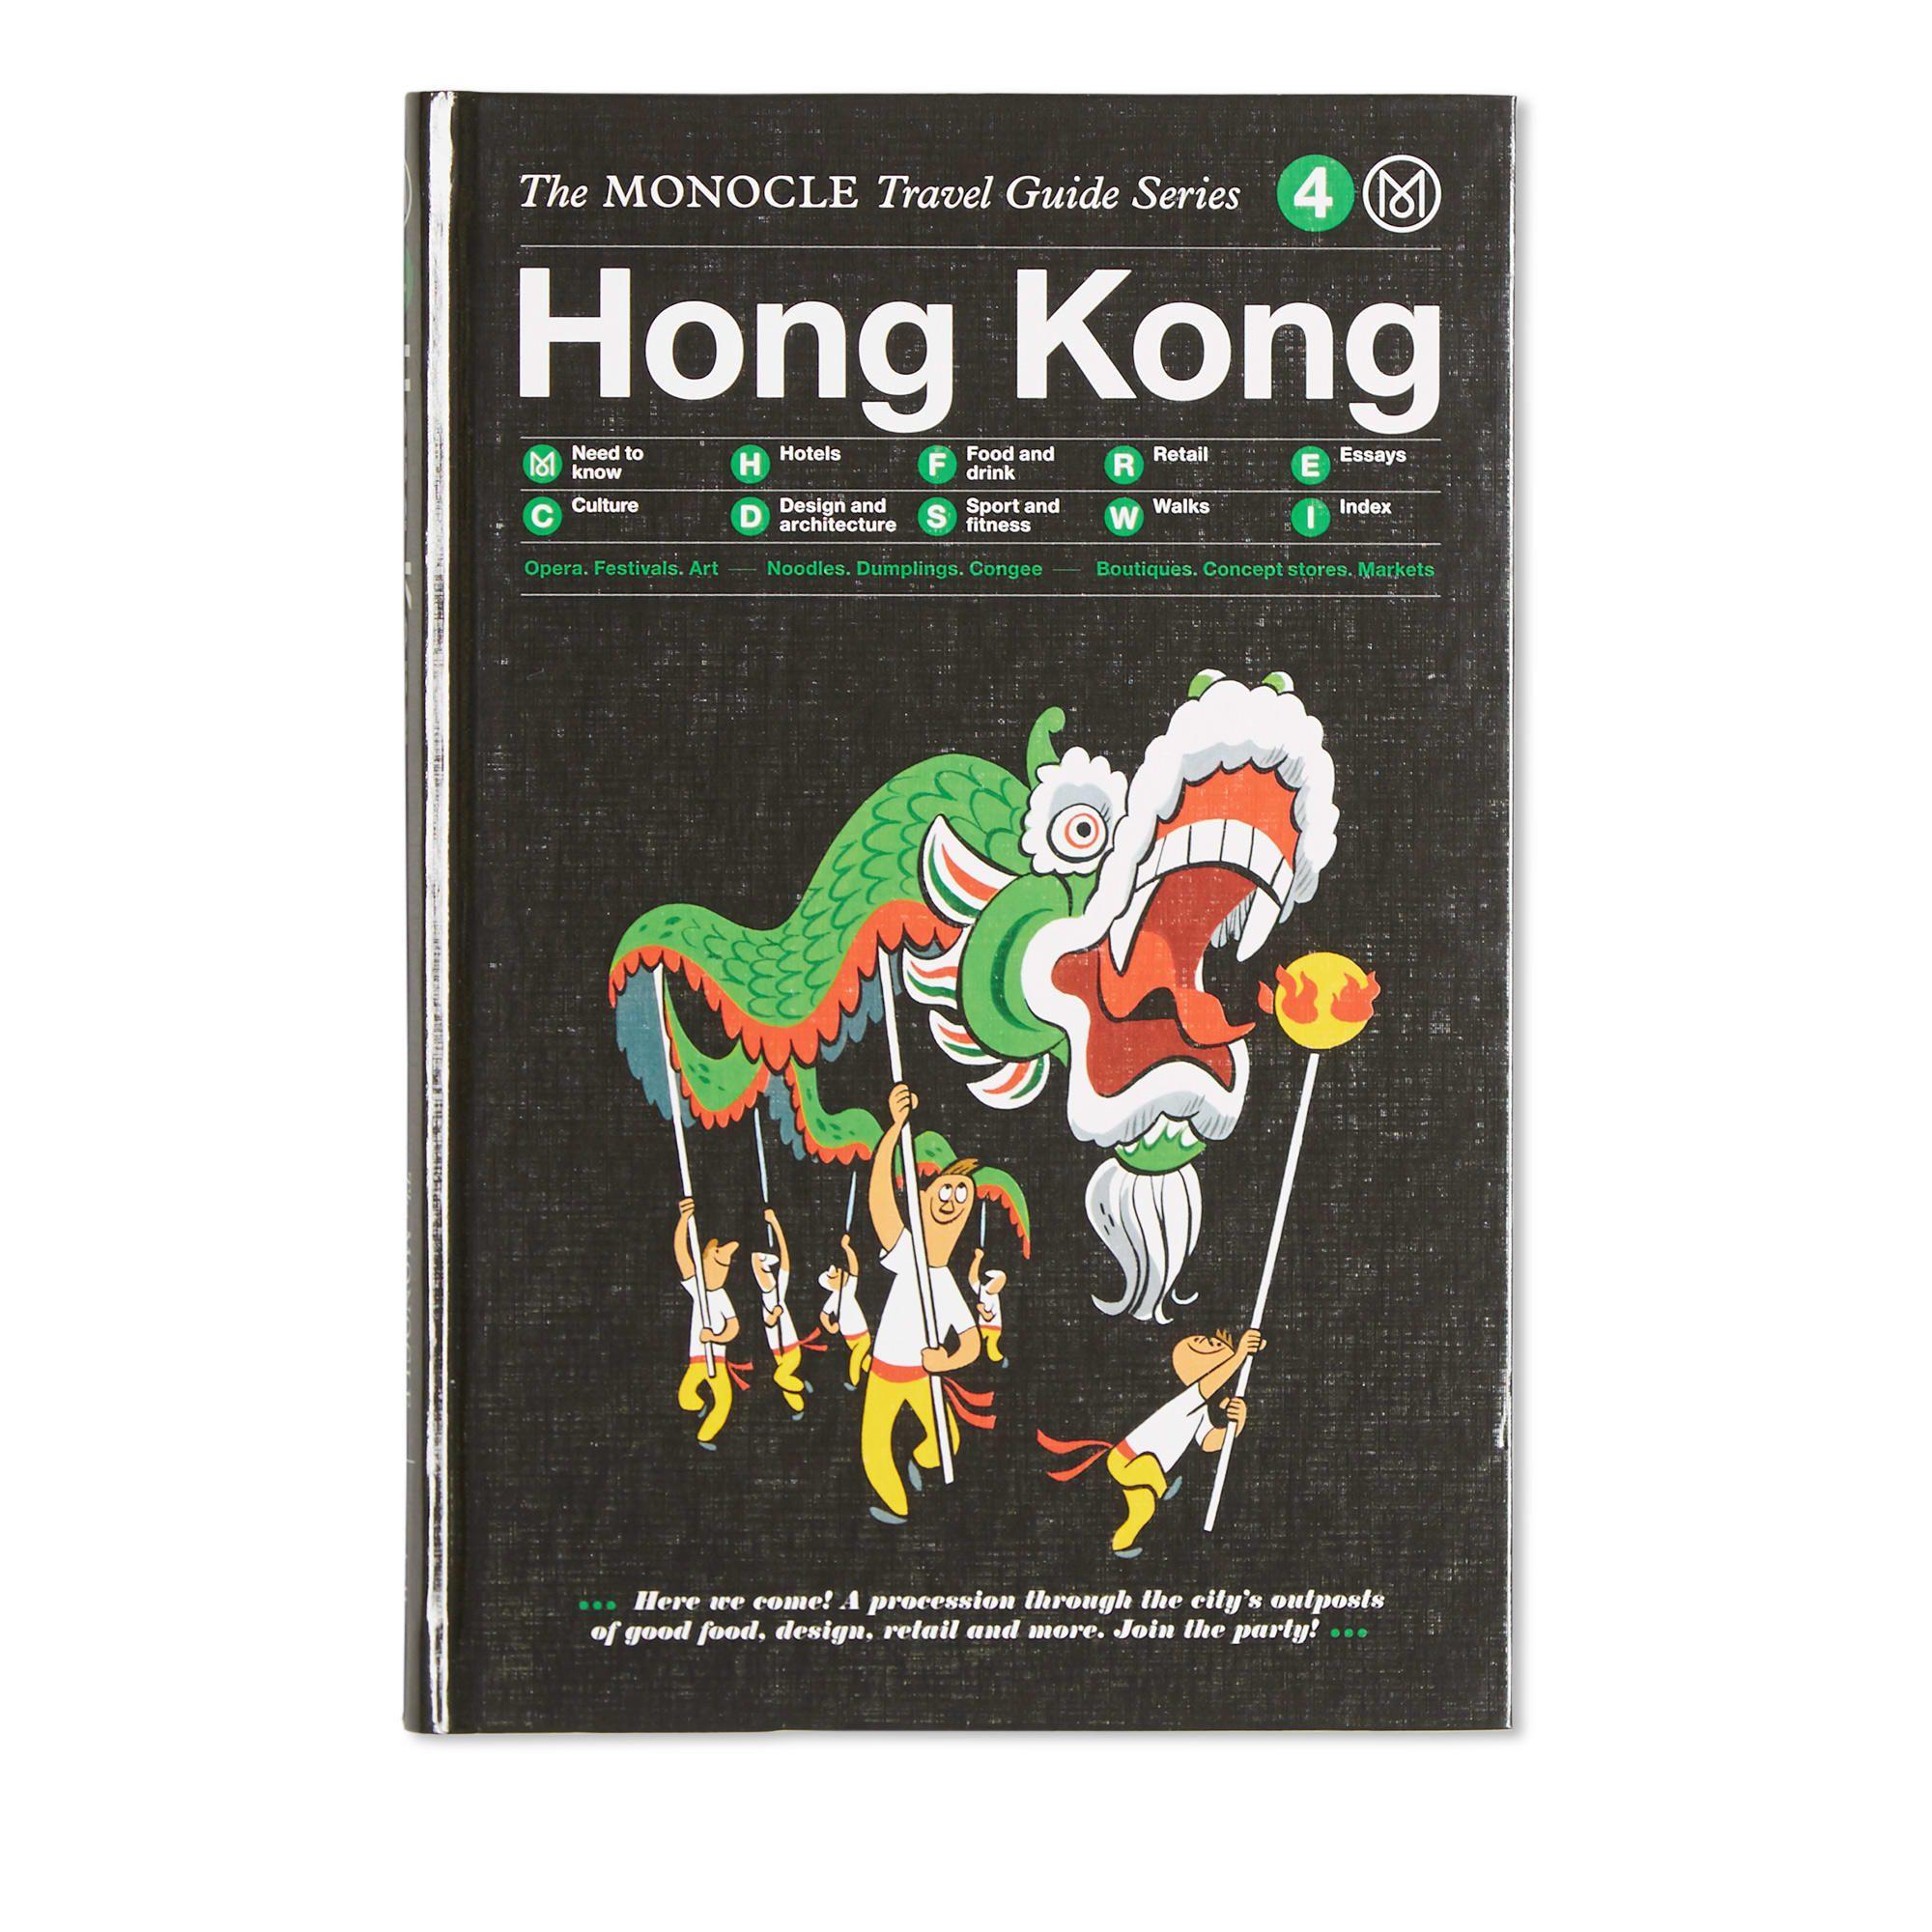 PUBLICATIONS THE MONOCLE TRAVEL GUIDE: HONG KONG. #publications